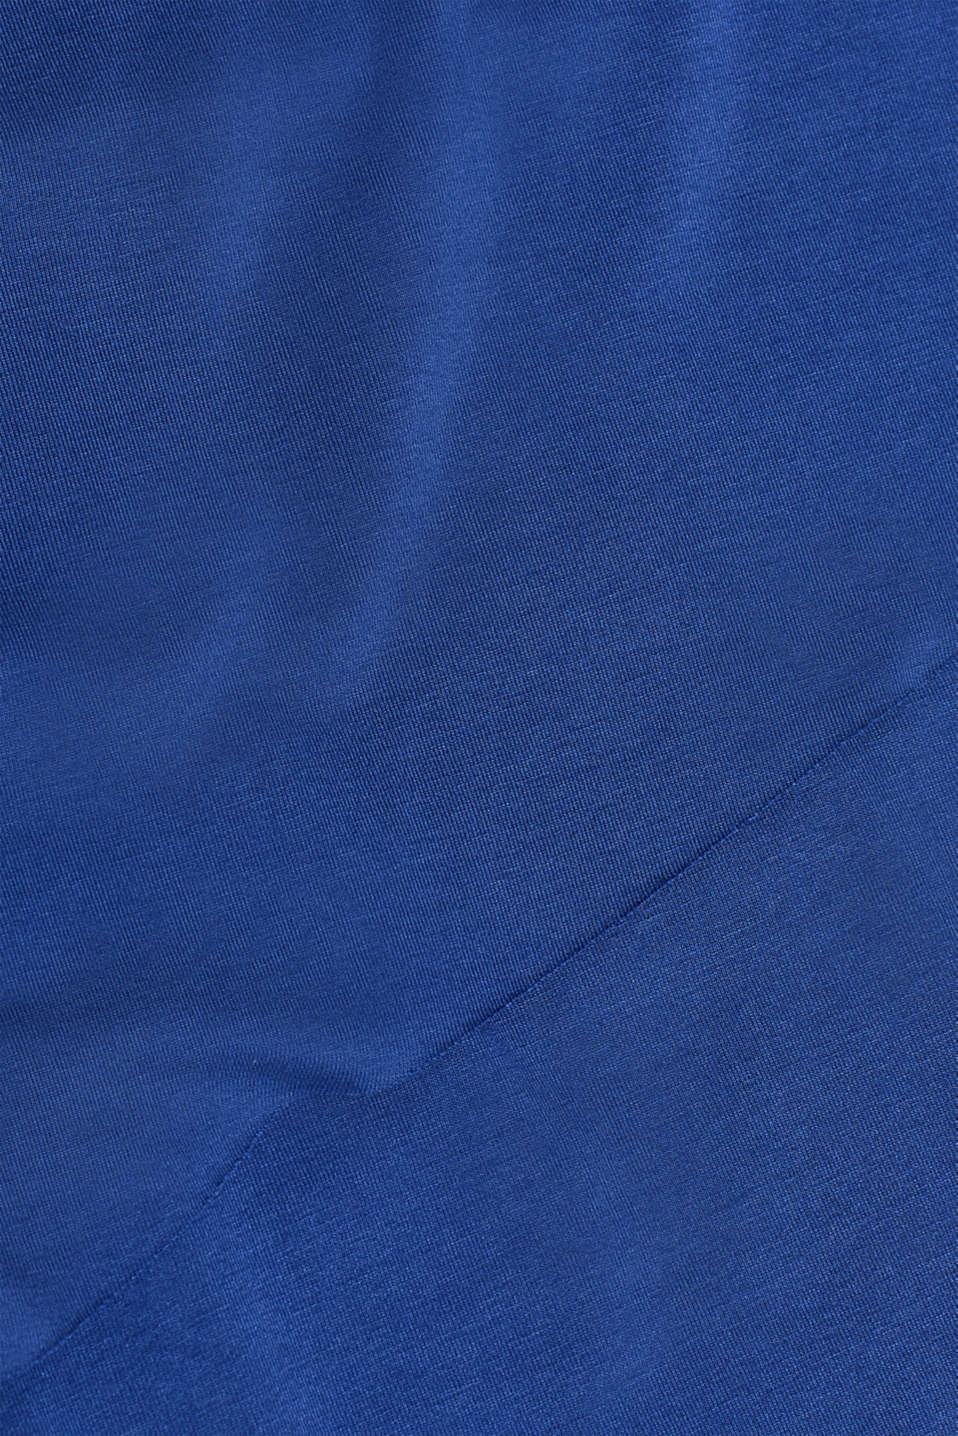 Layered-effect stretch nursing top, LCDARK BLUE, detail image number 4